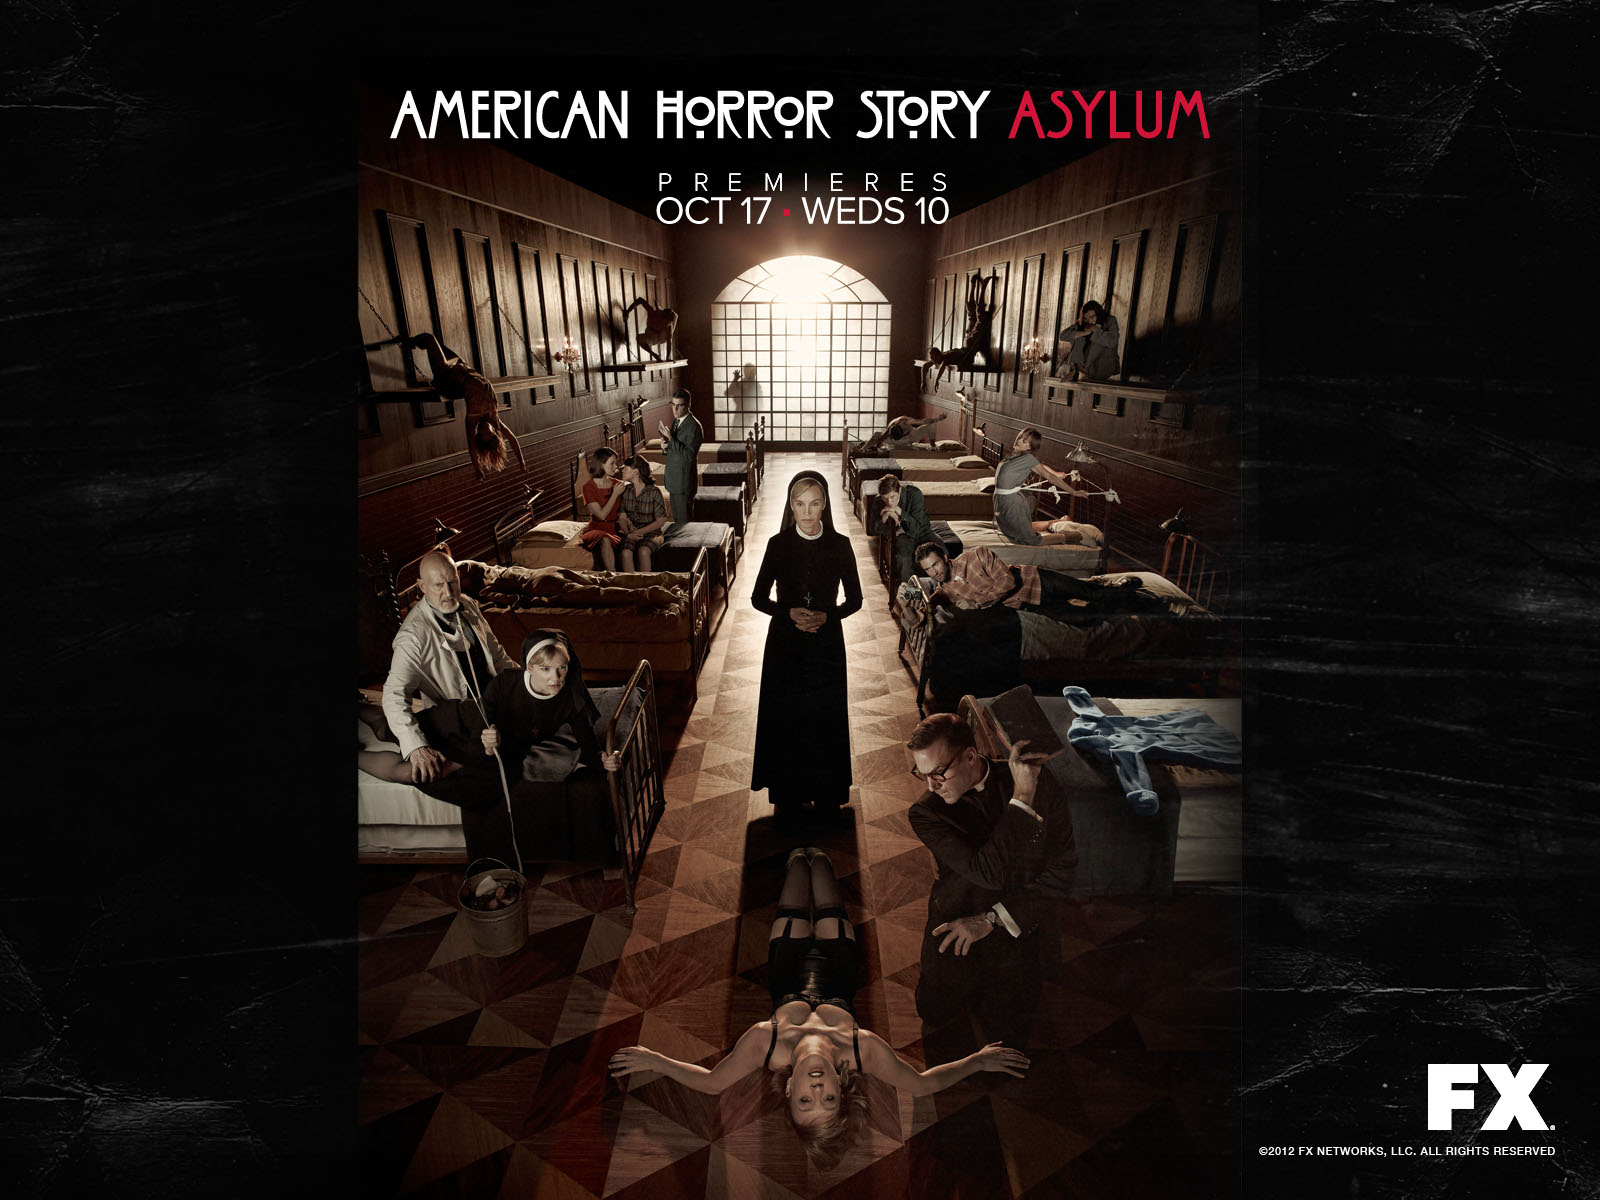 http://www.backtothegeek.com/wp-content/uploads/2012/10/american-horror-story-wallpaper-serie-hd-1600x1200.jpg